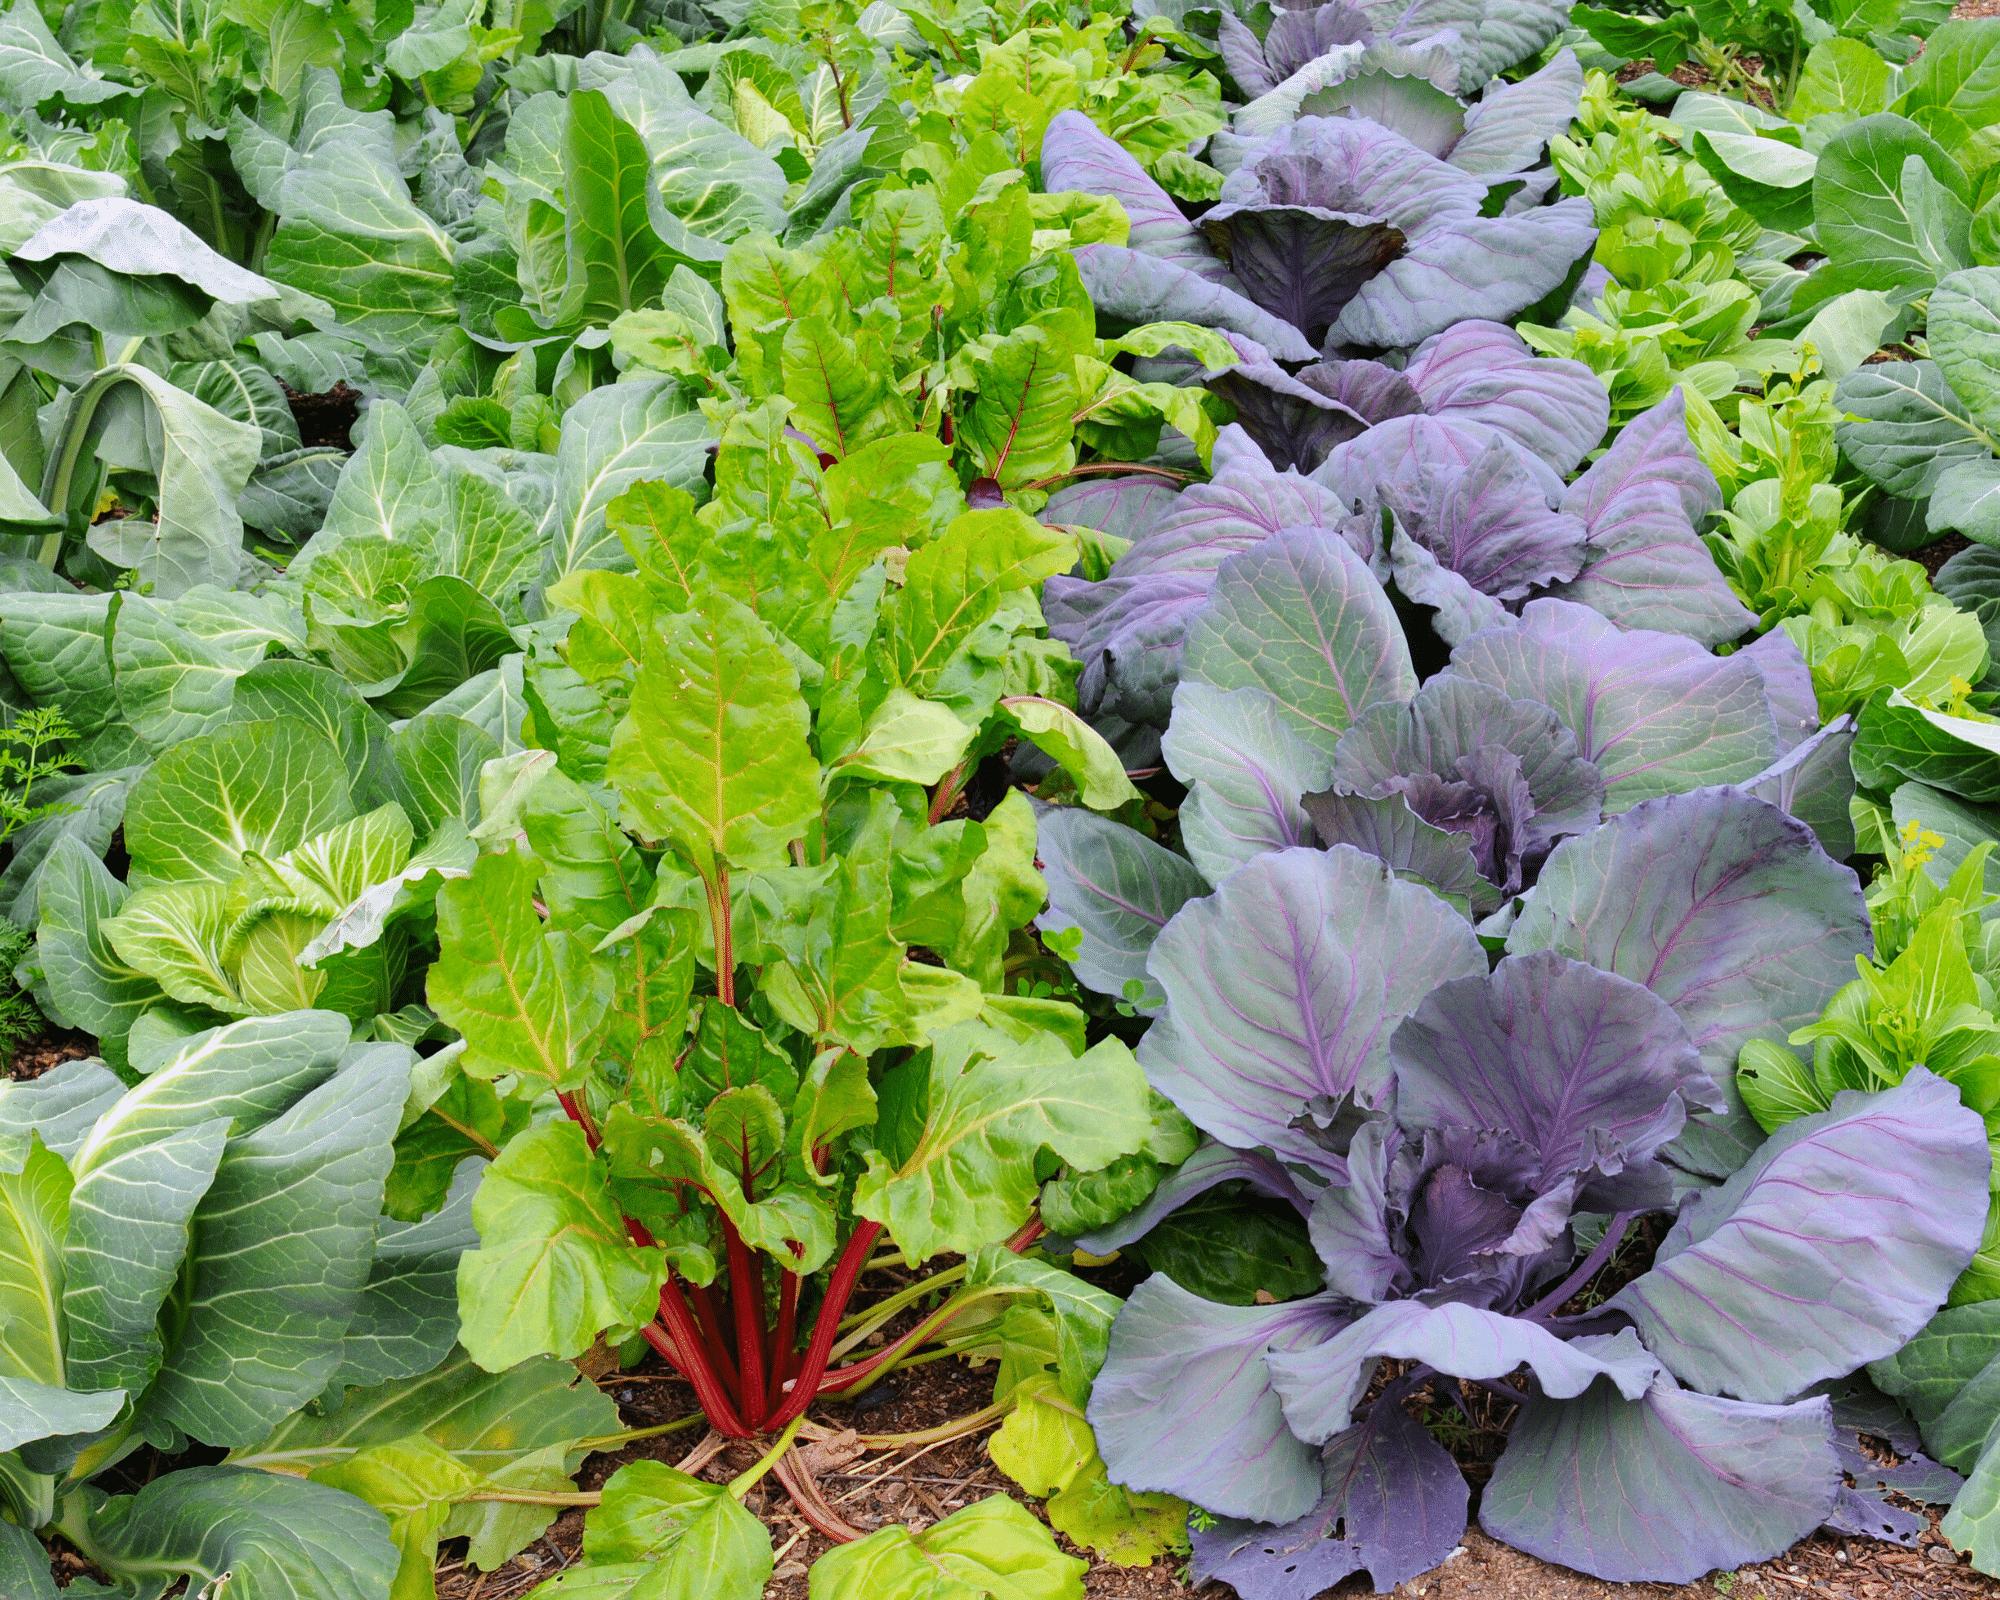 beginner's guide to gardening - multiple rows of lettuce in a garden